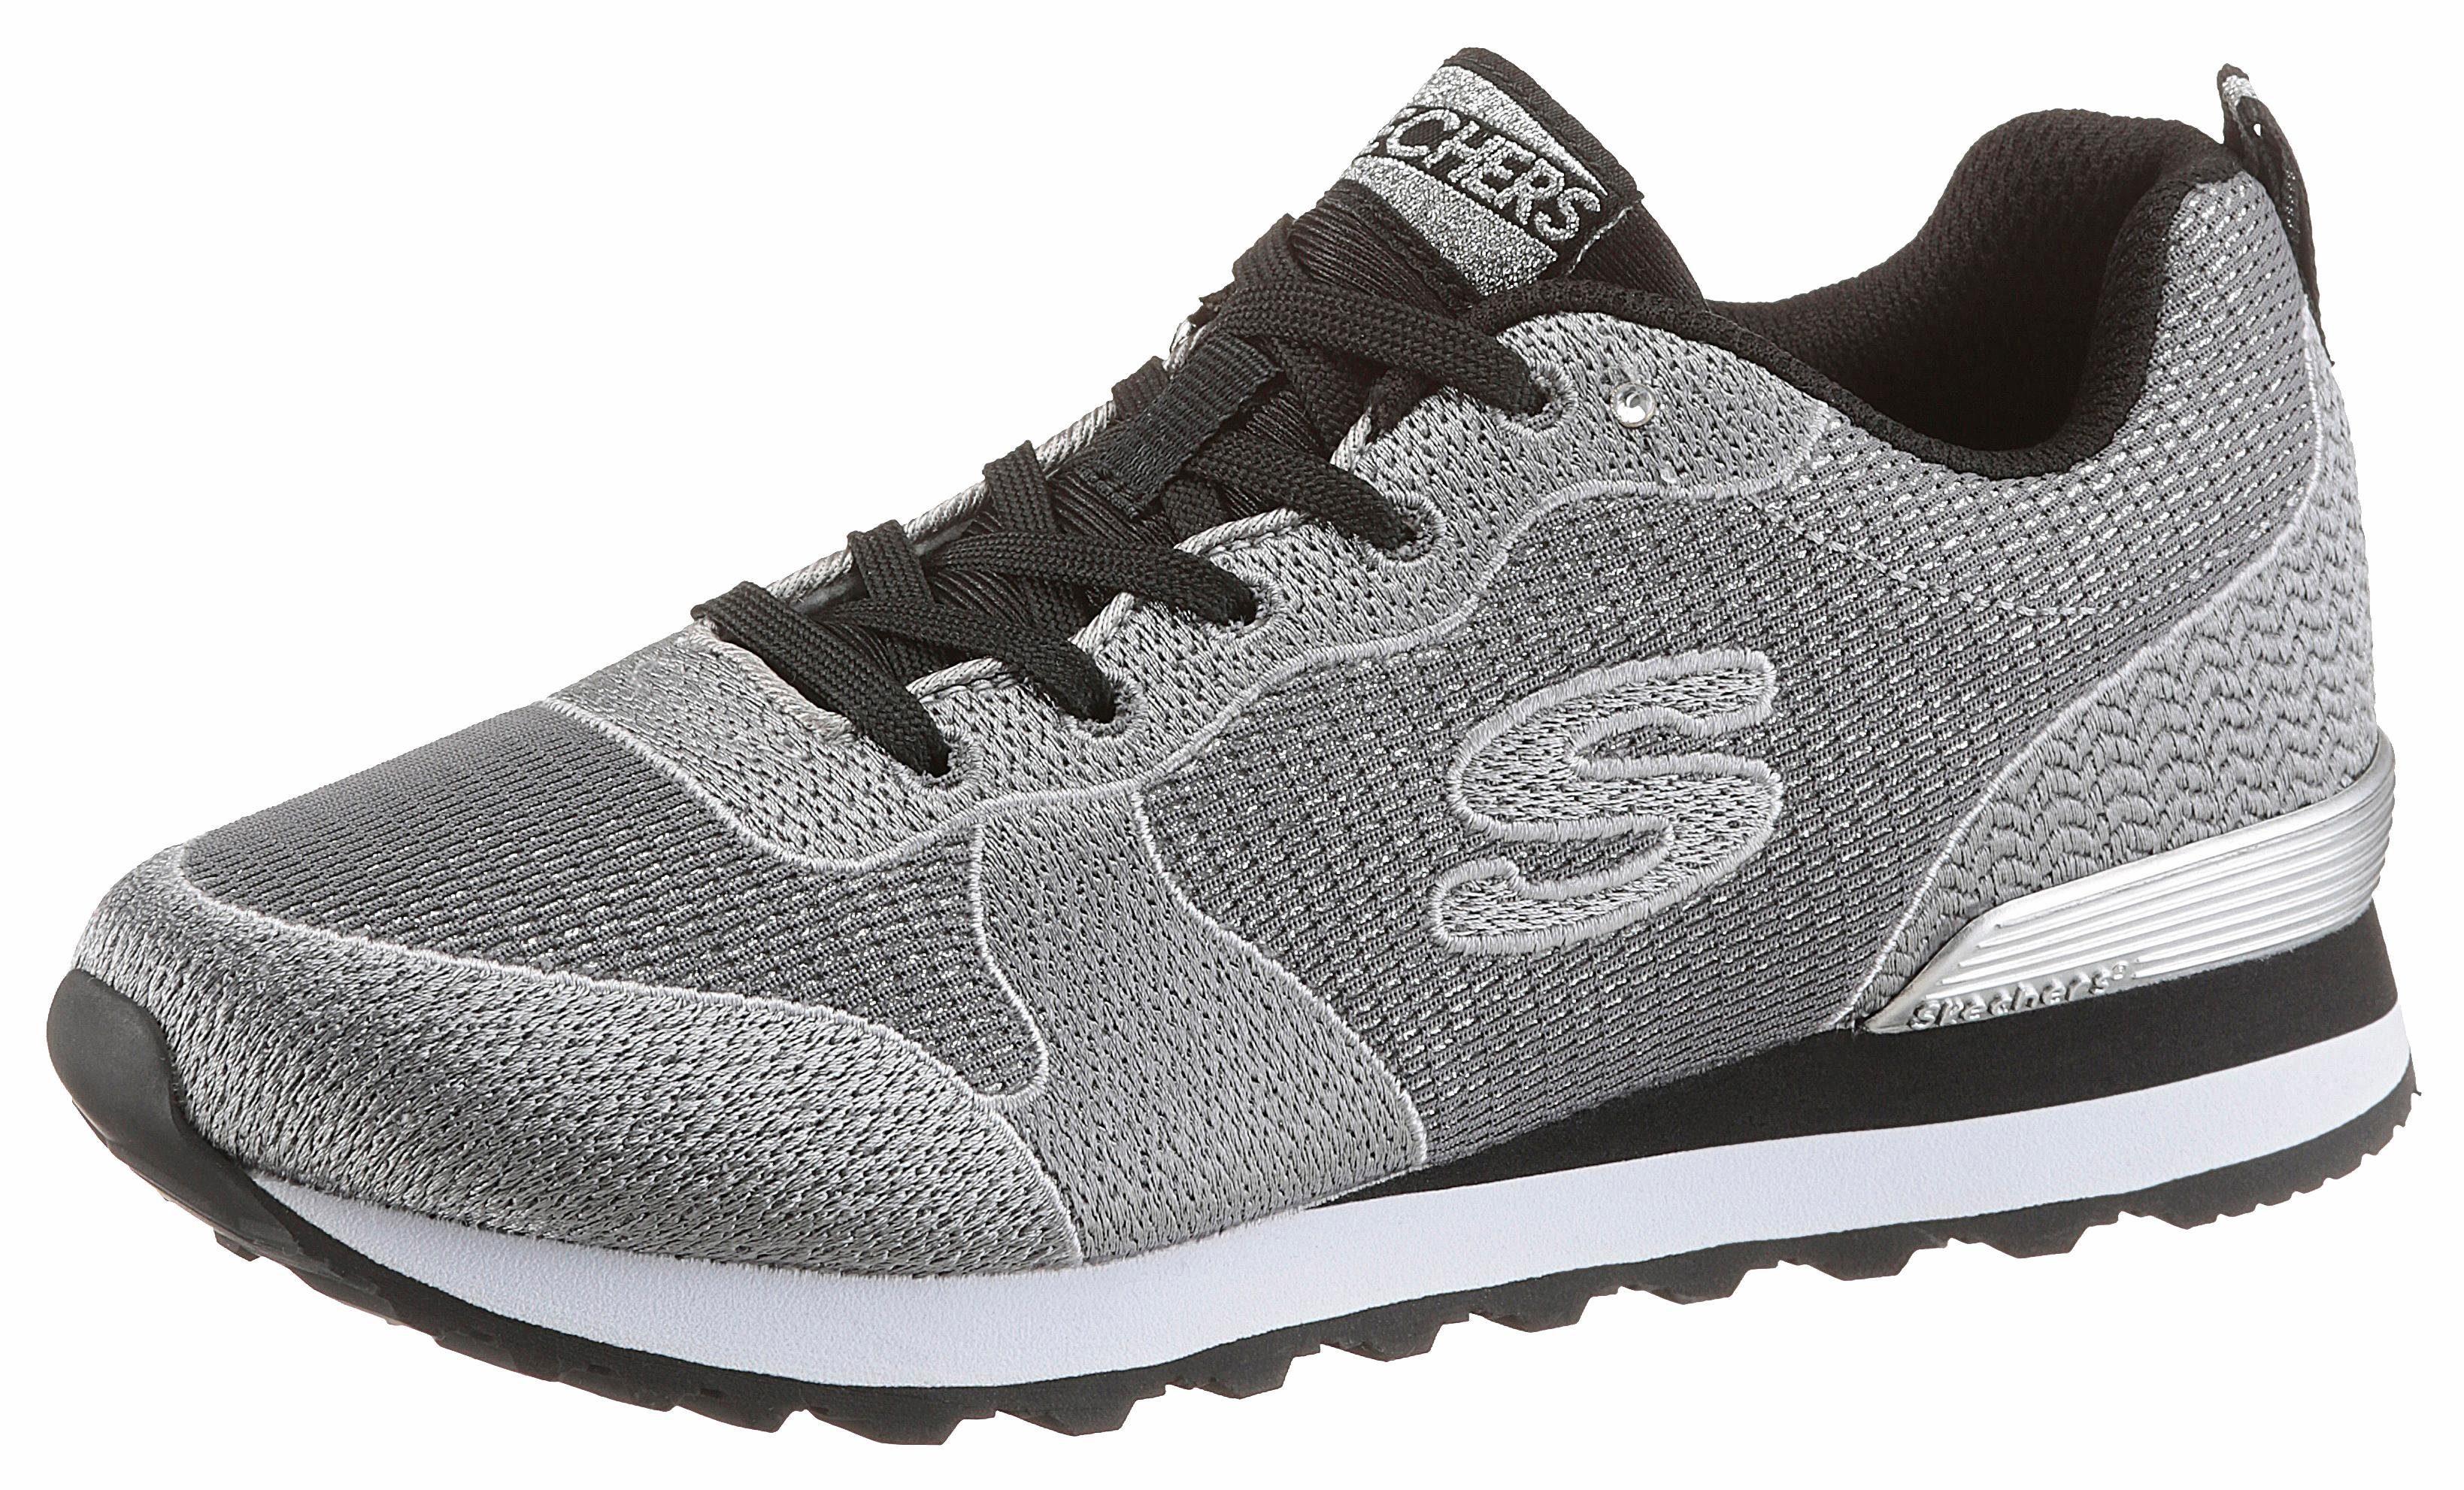 Skechers Sneakers Gris 4pqUGwQqJb